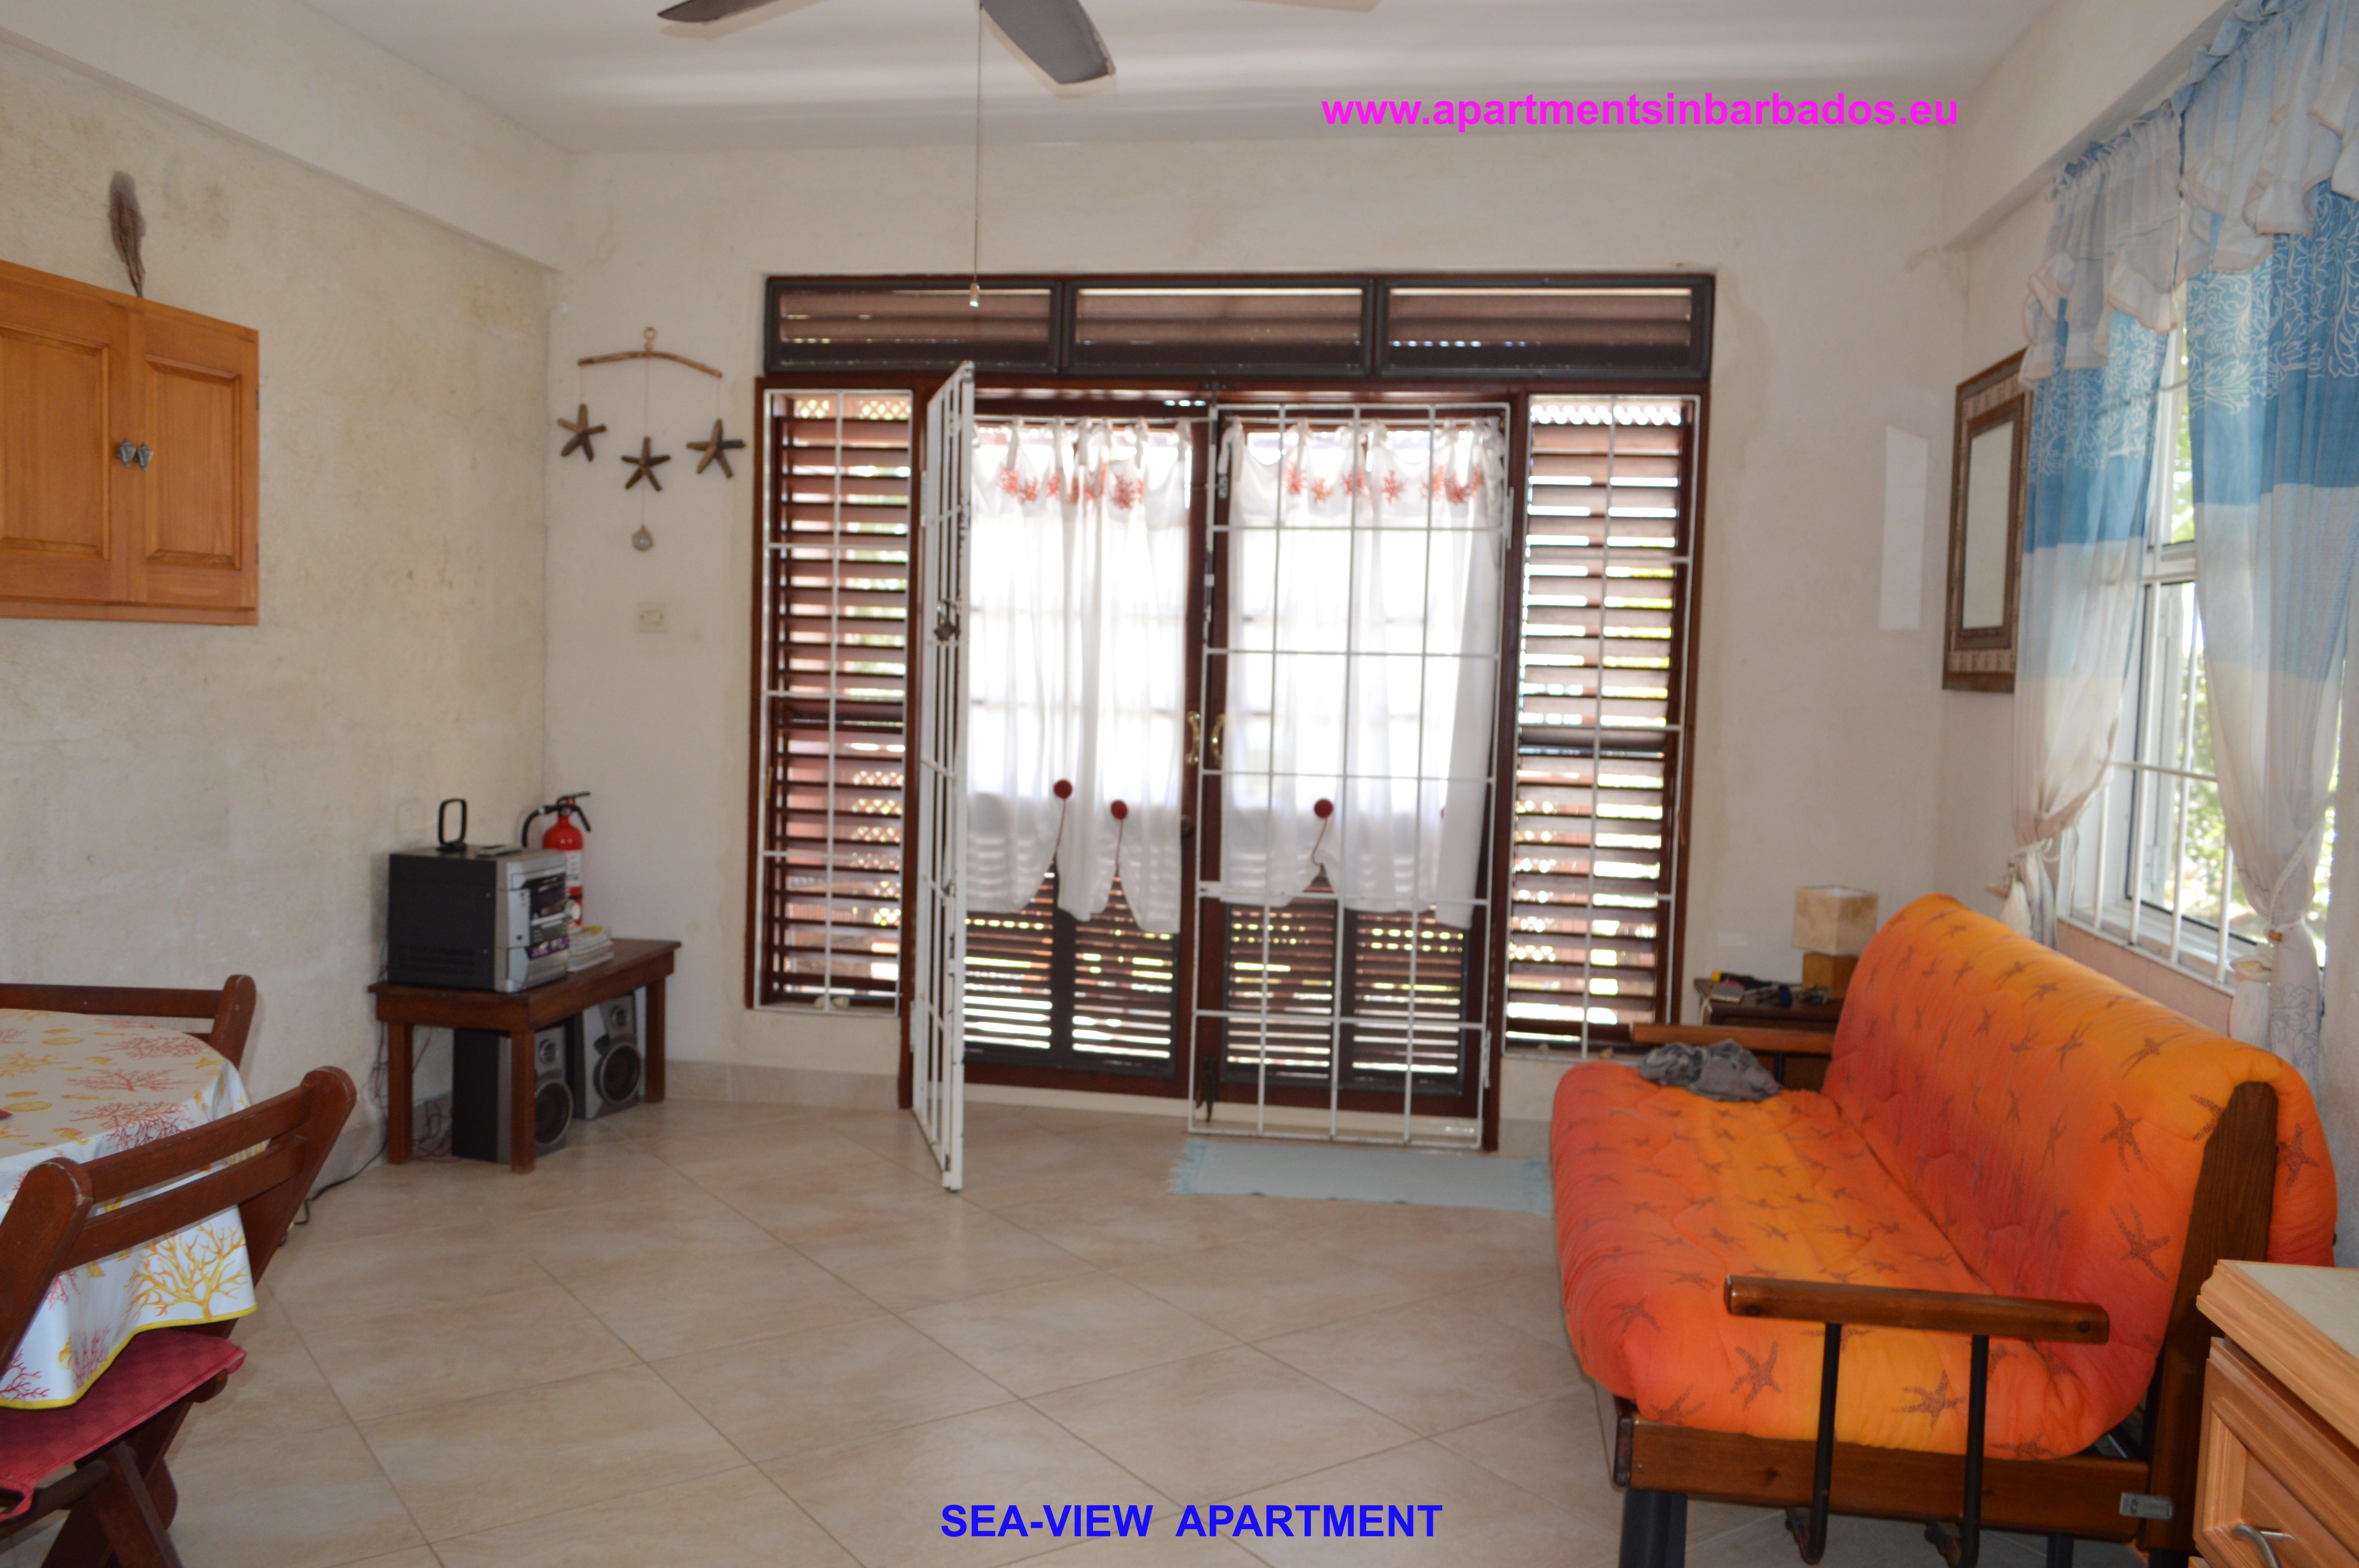 Sea-view Apartment - Living area